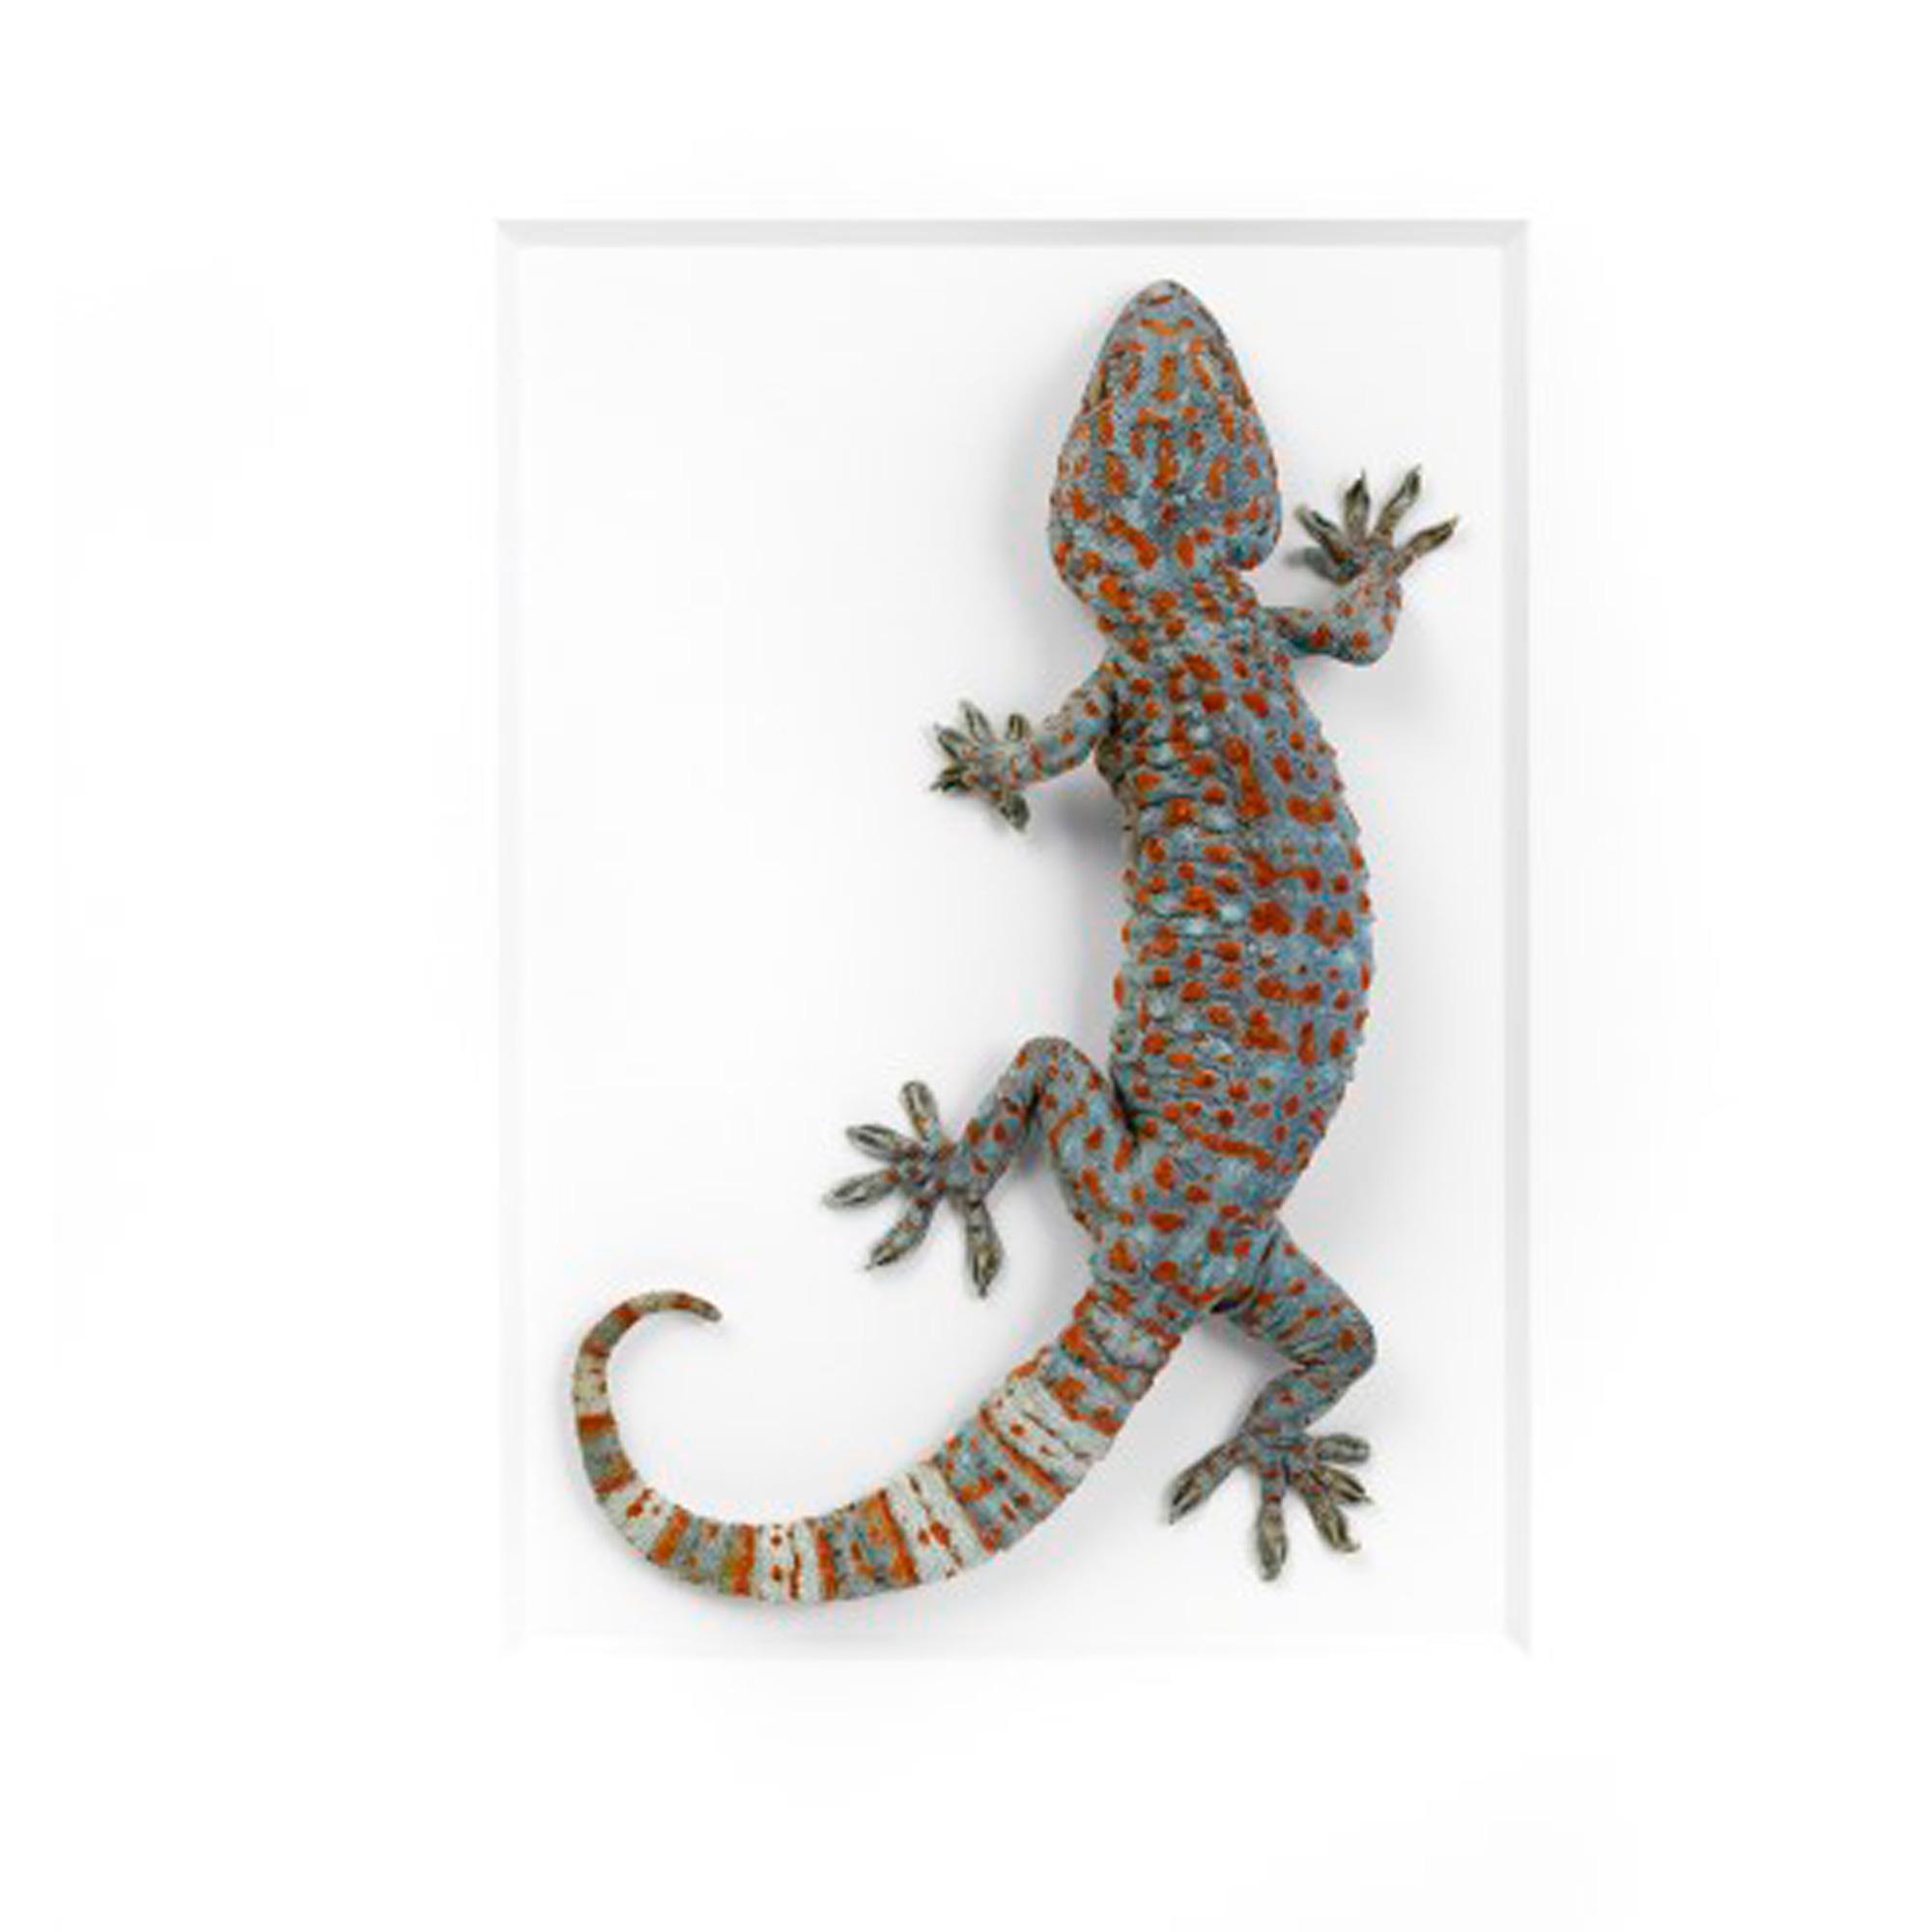 11 x 14 tokay gecko house of whitley